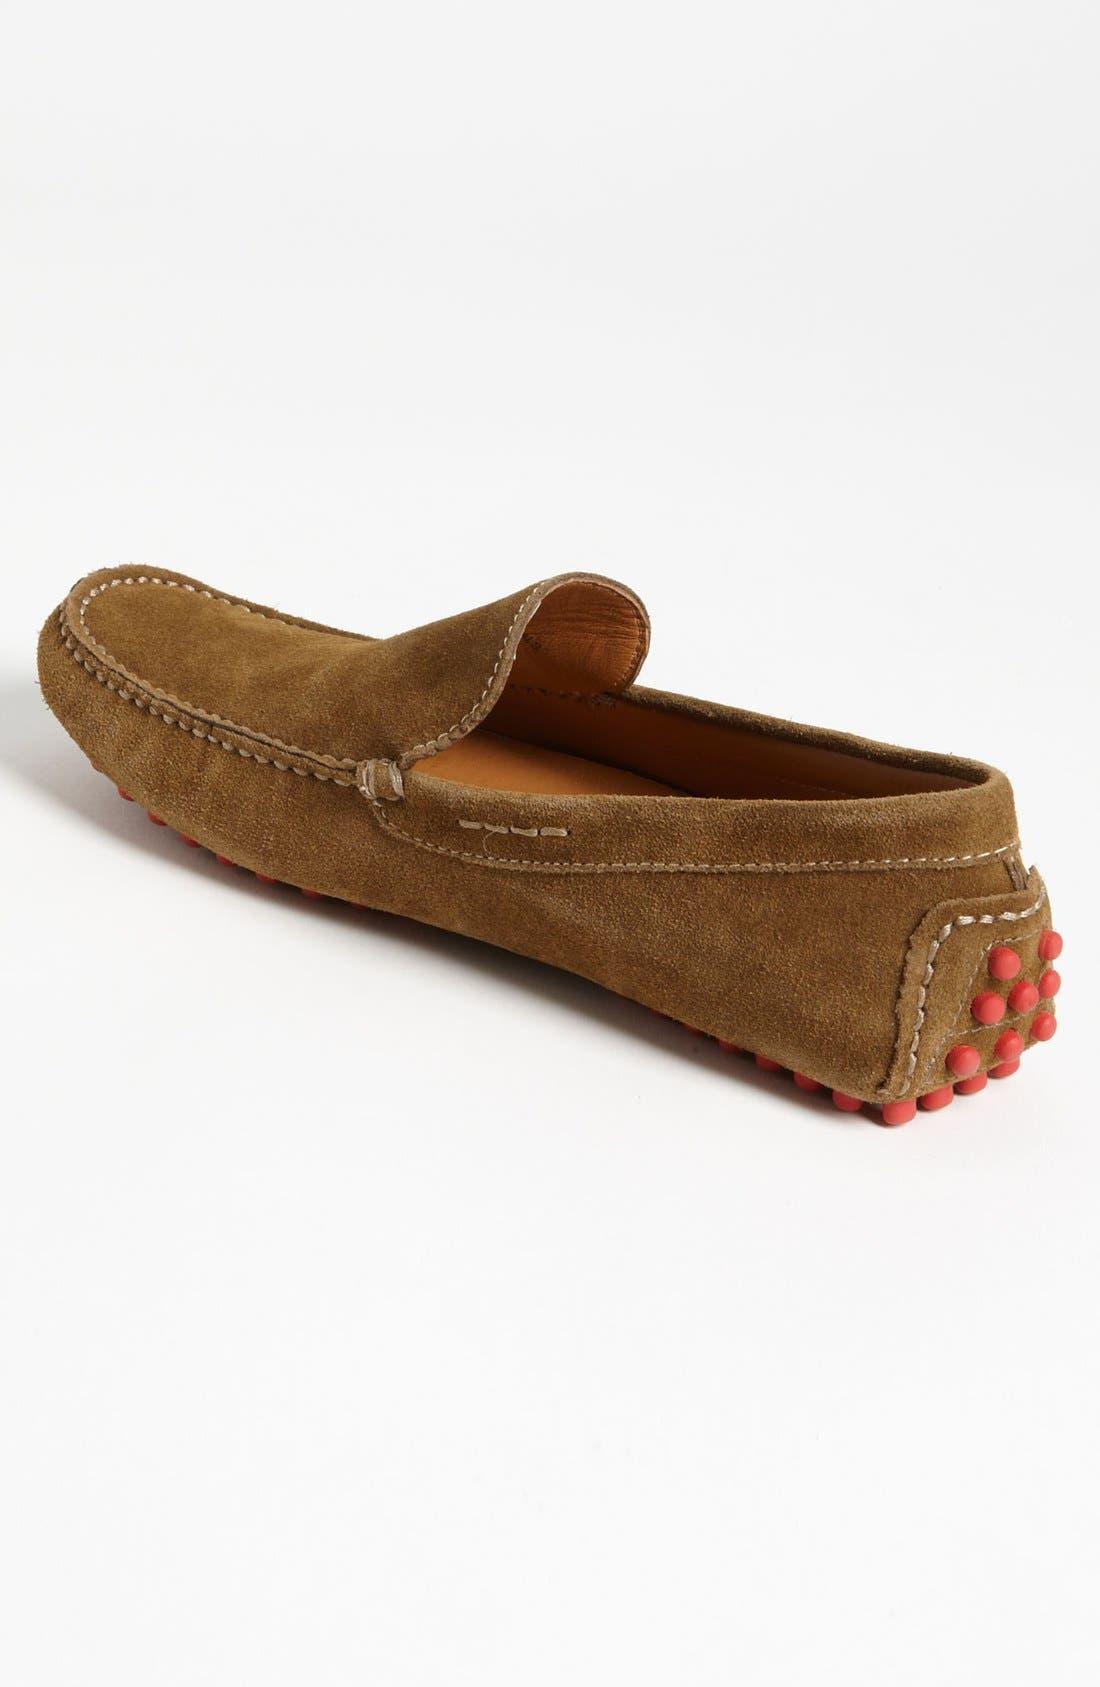 'Montego' Driving Shoe,                             Alternate thumbnail 4, color,                             206